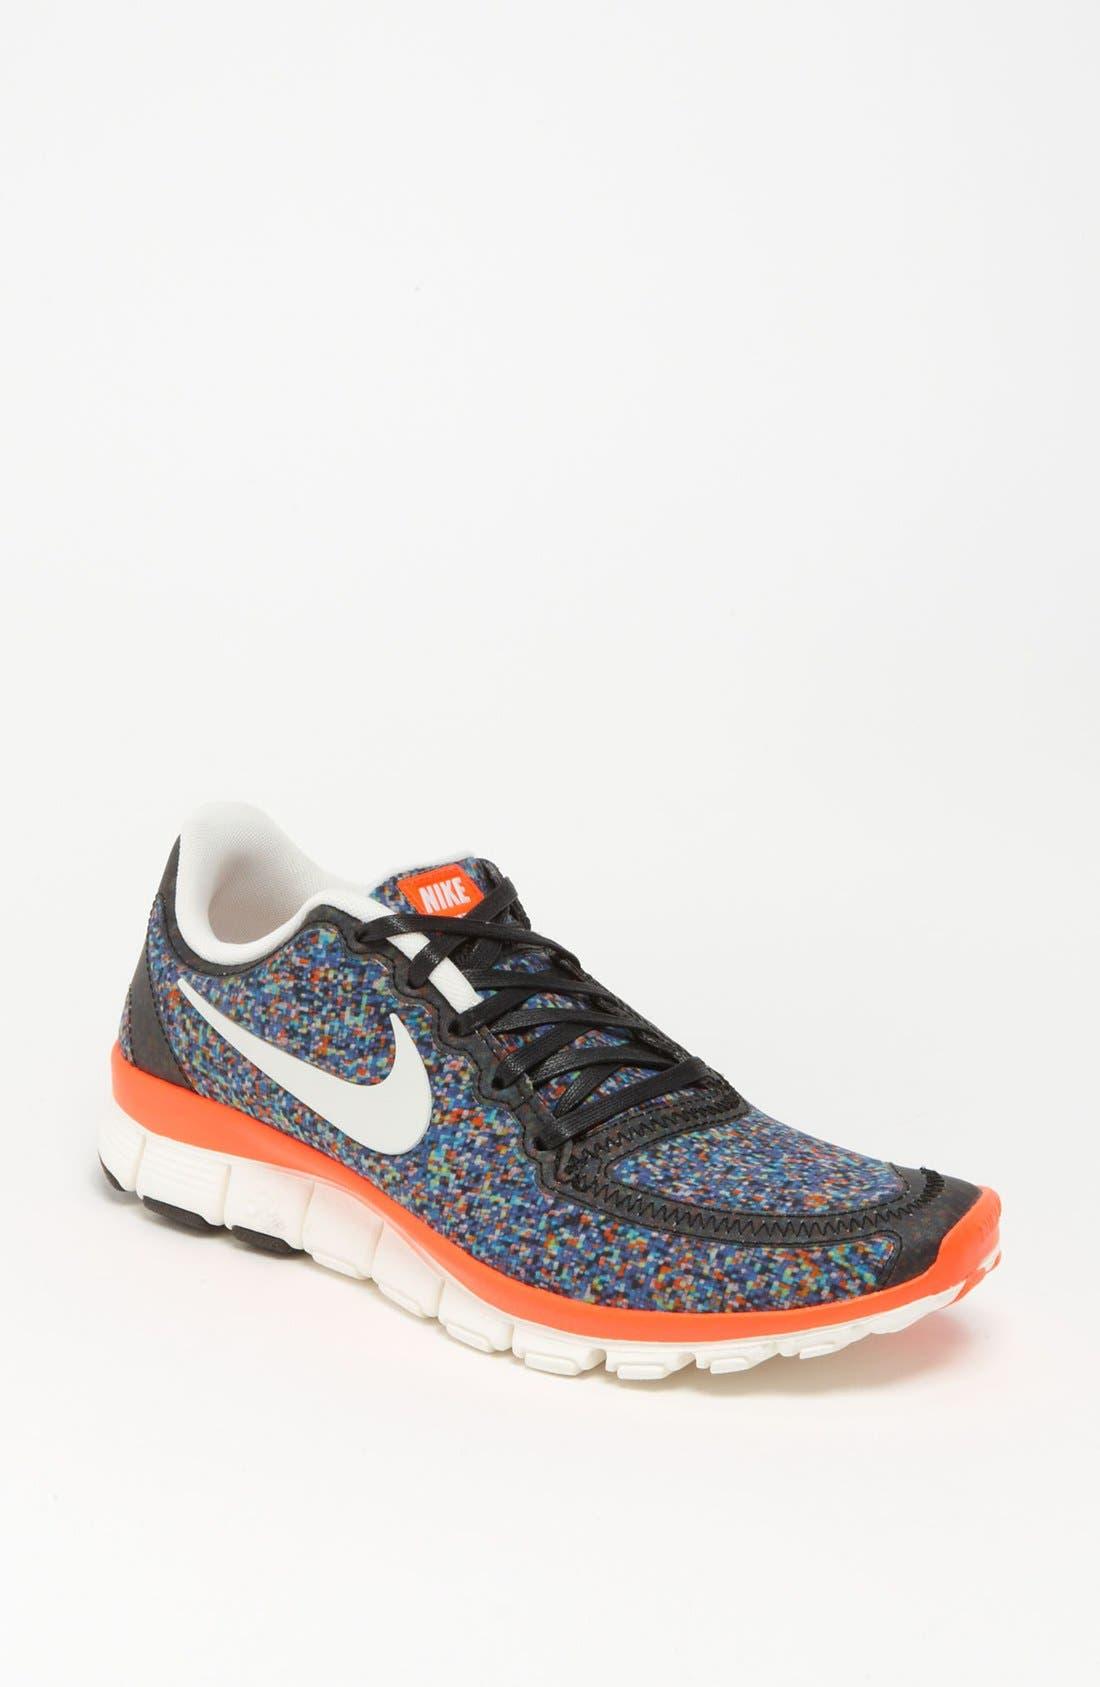 Main Image - Nike 'Free 5.0 Liberty' Sneaker (Women)